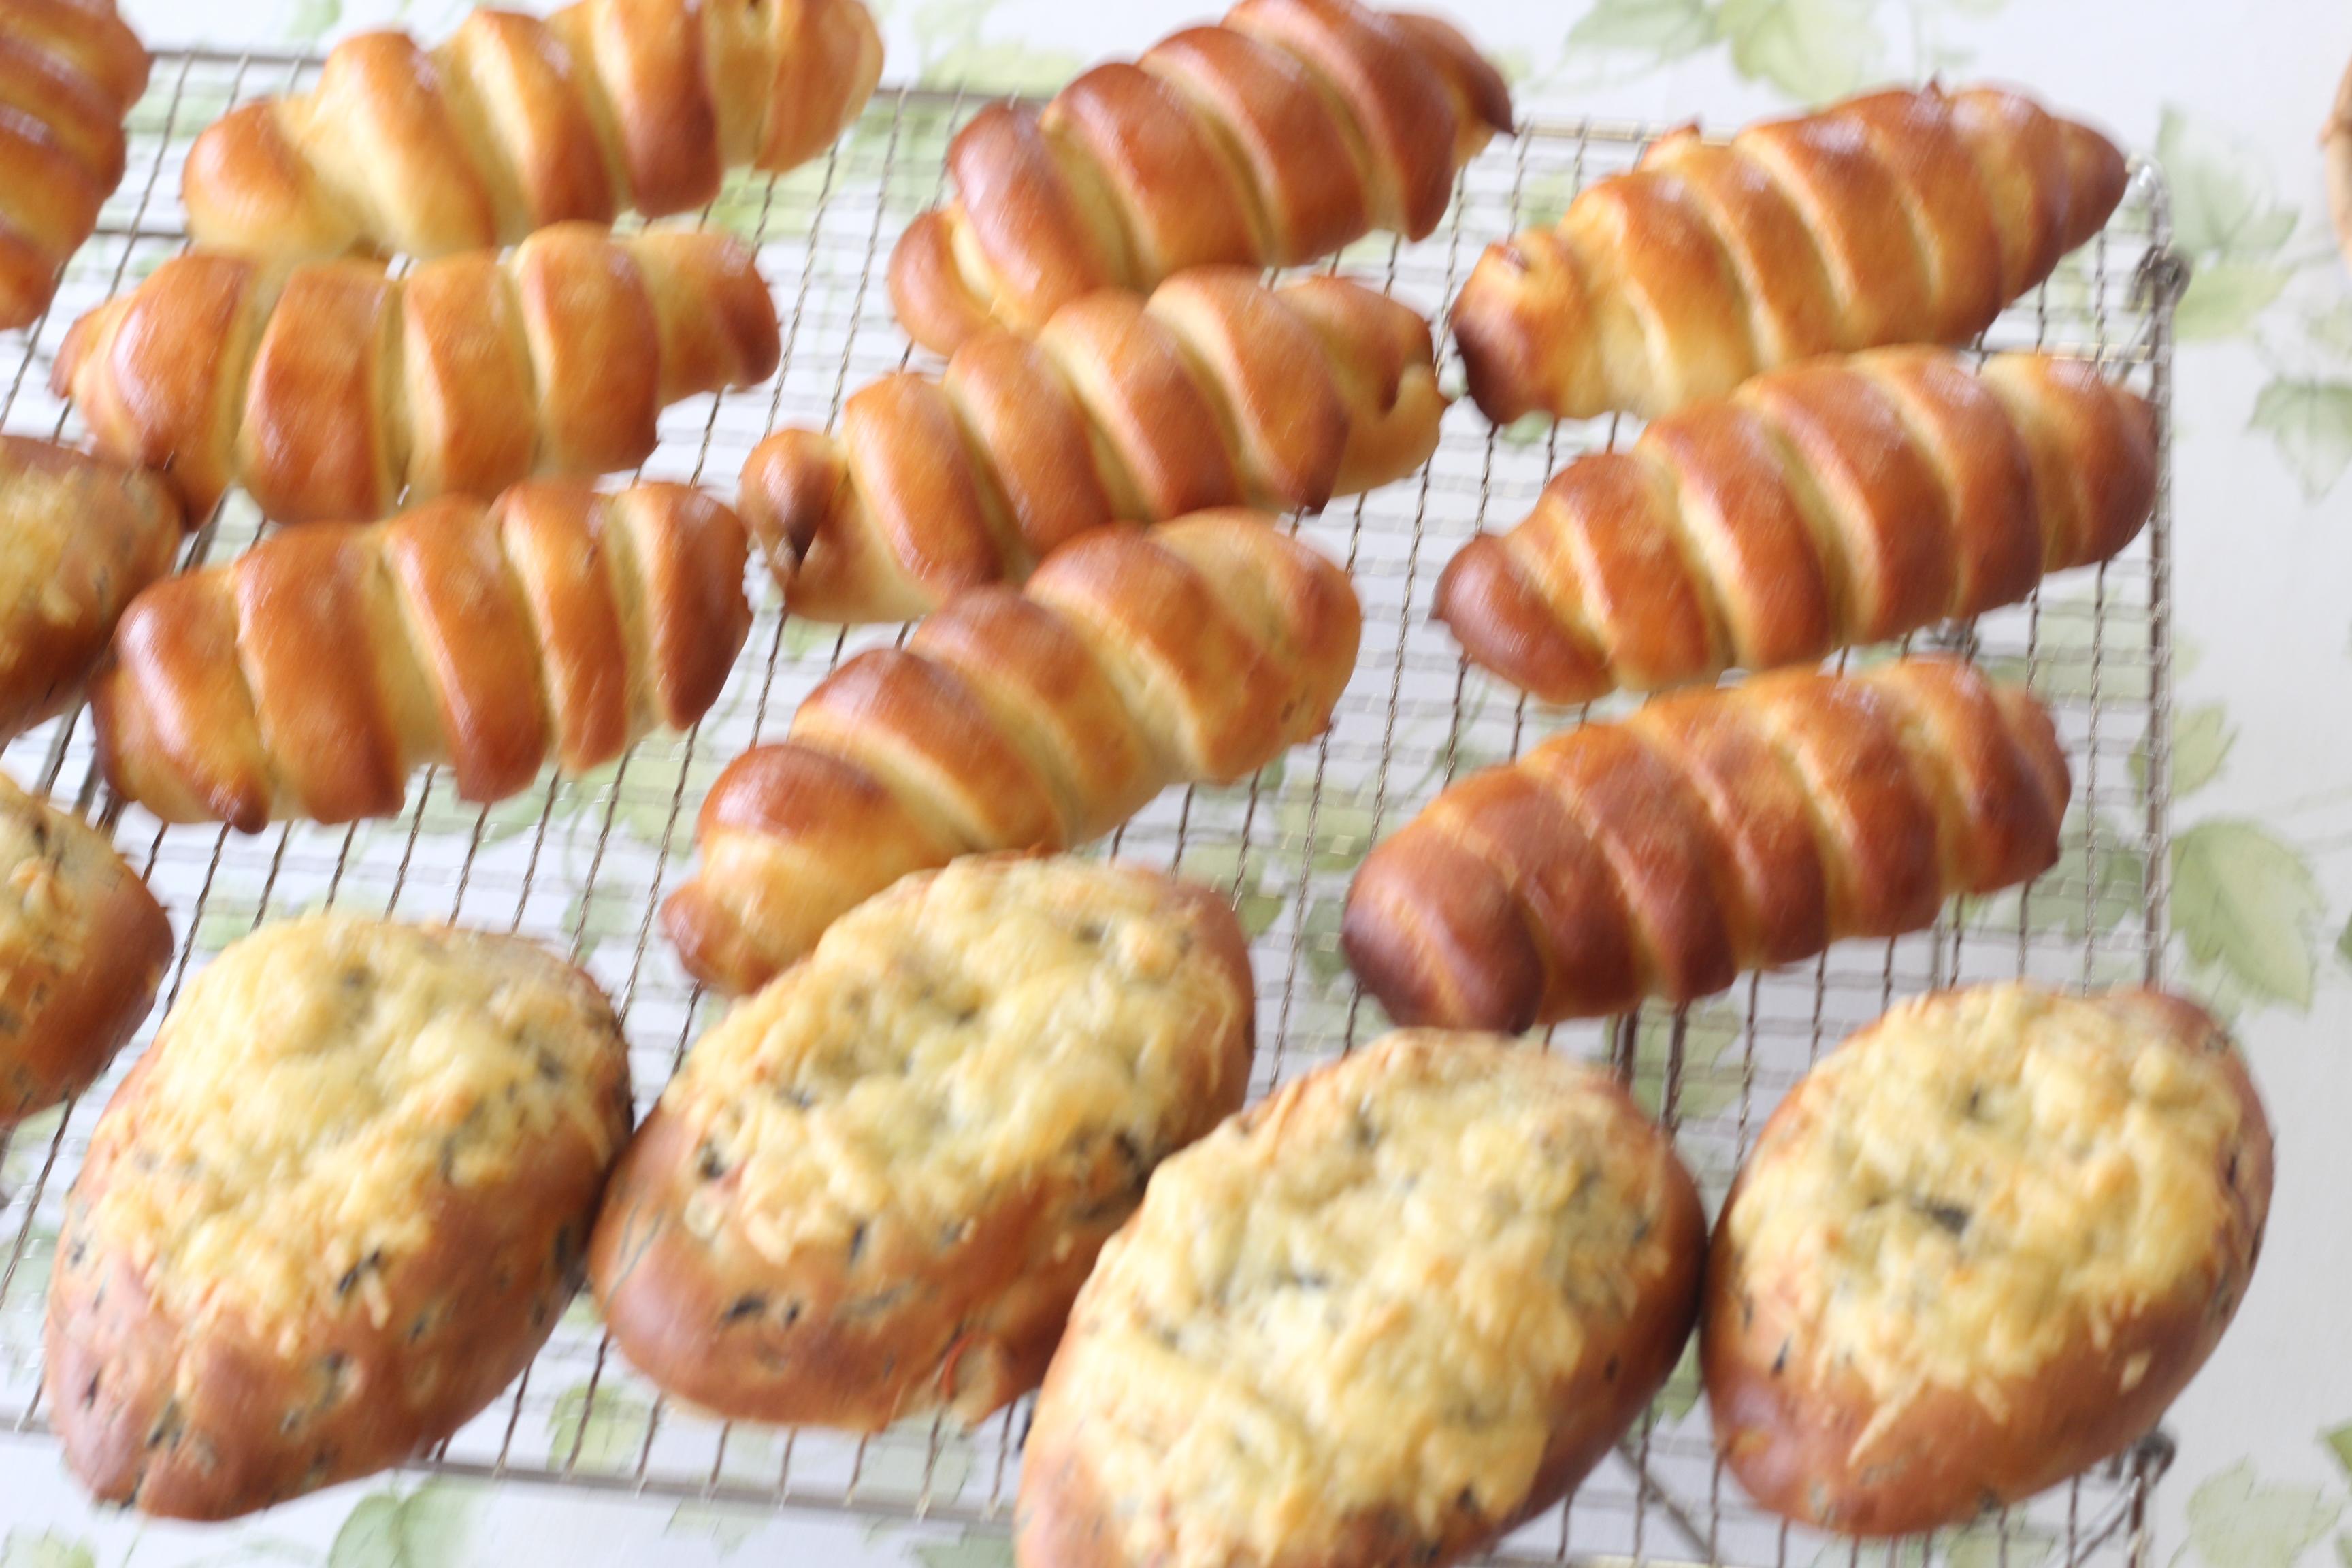 a-ta-sante糖質制限パン料理教室、阿倍野区西田辺。京都江部粉ベーシック子^す4回目『ひじきブレッド&クリームパン』